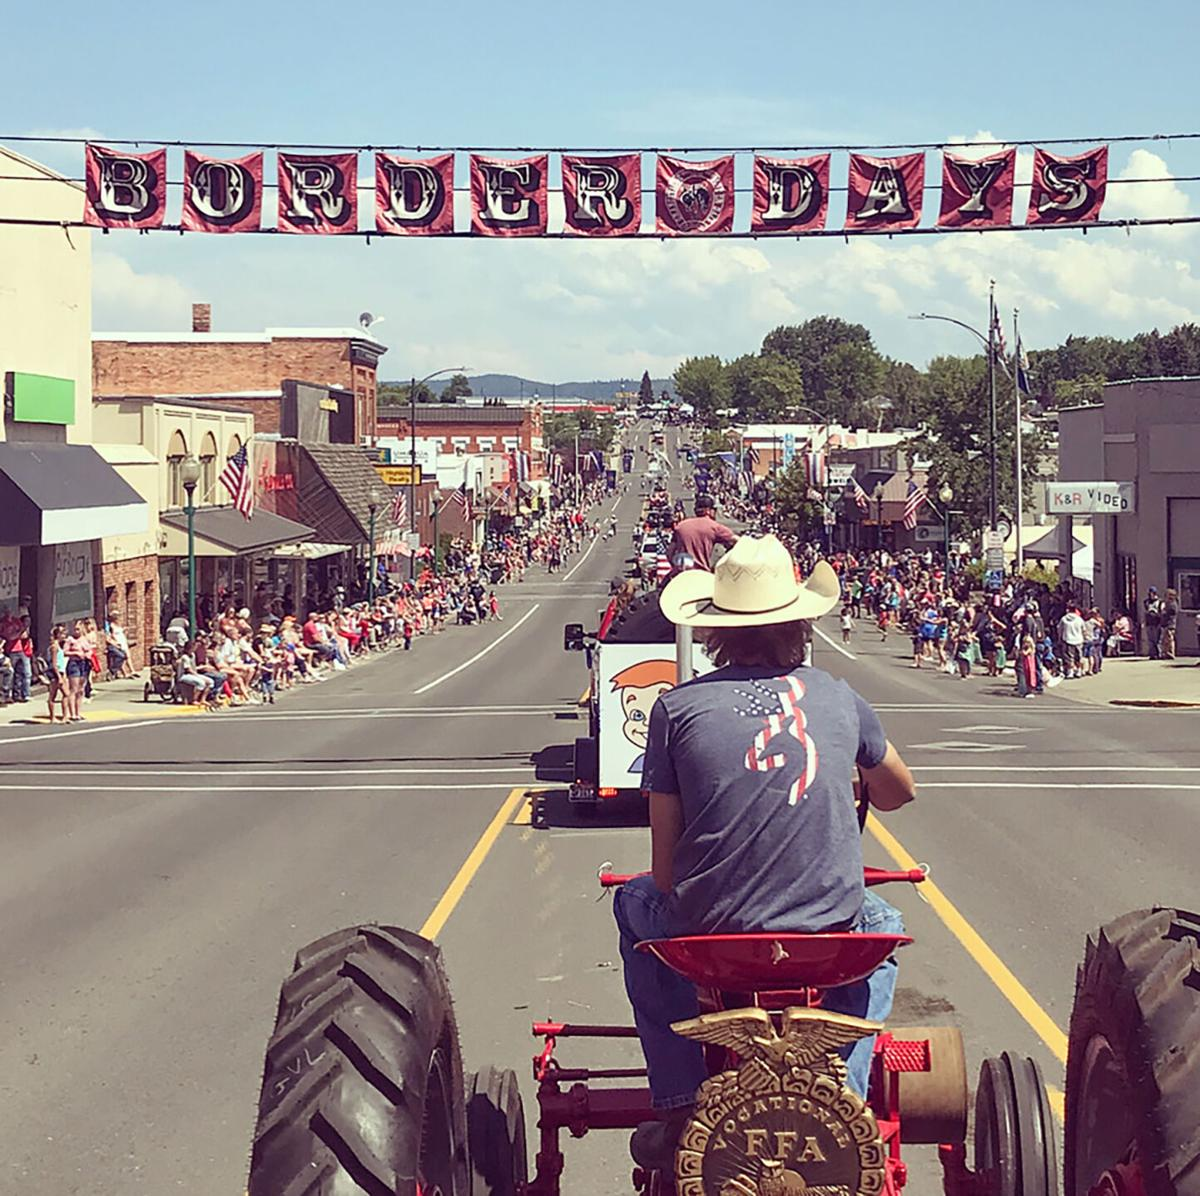 Farmall tractor at the Border Days parade photo